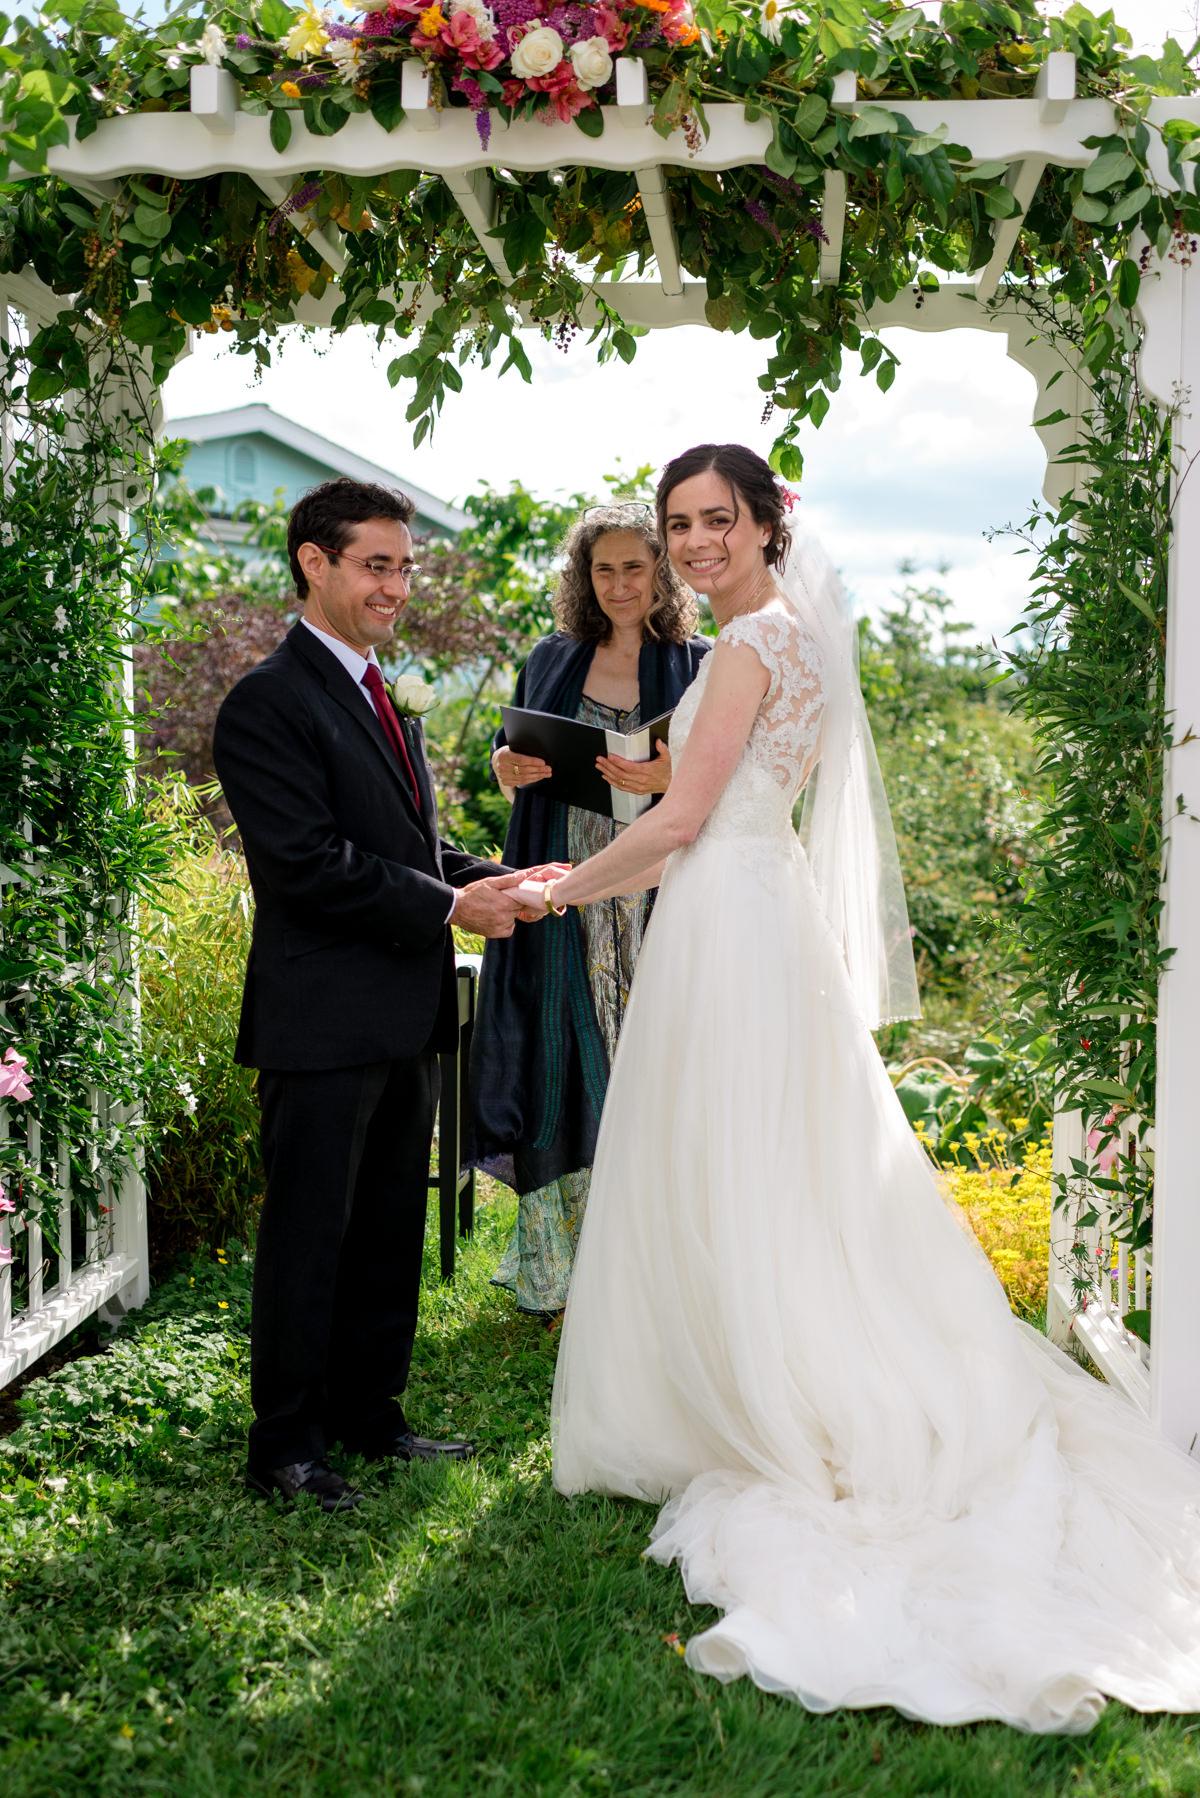 Andrew Tat - Documentary Wedding Photography - Kirkland, Washington - Emily & Cuauh - 16.JPG